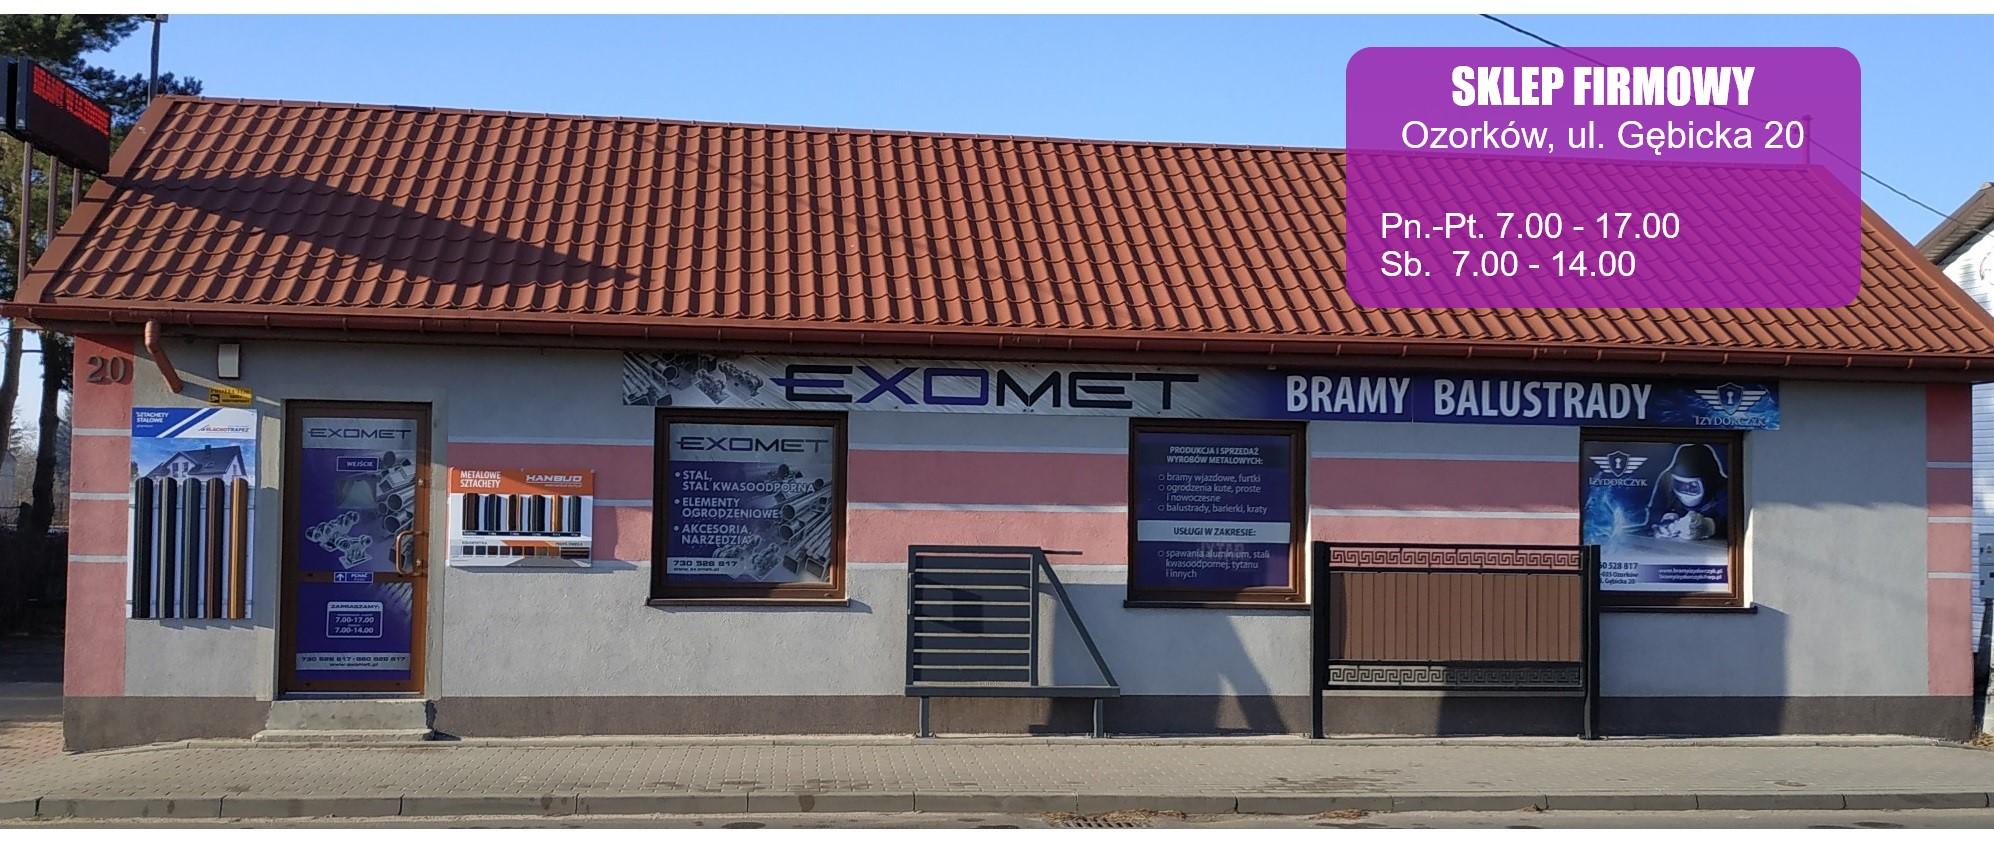 sklep metalowy Exomet